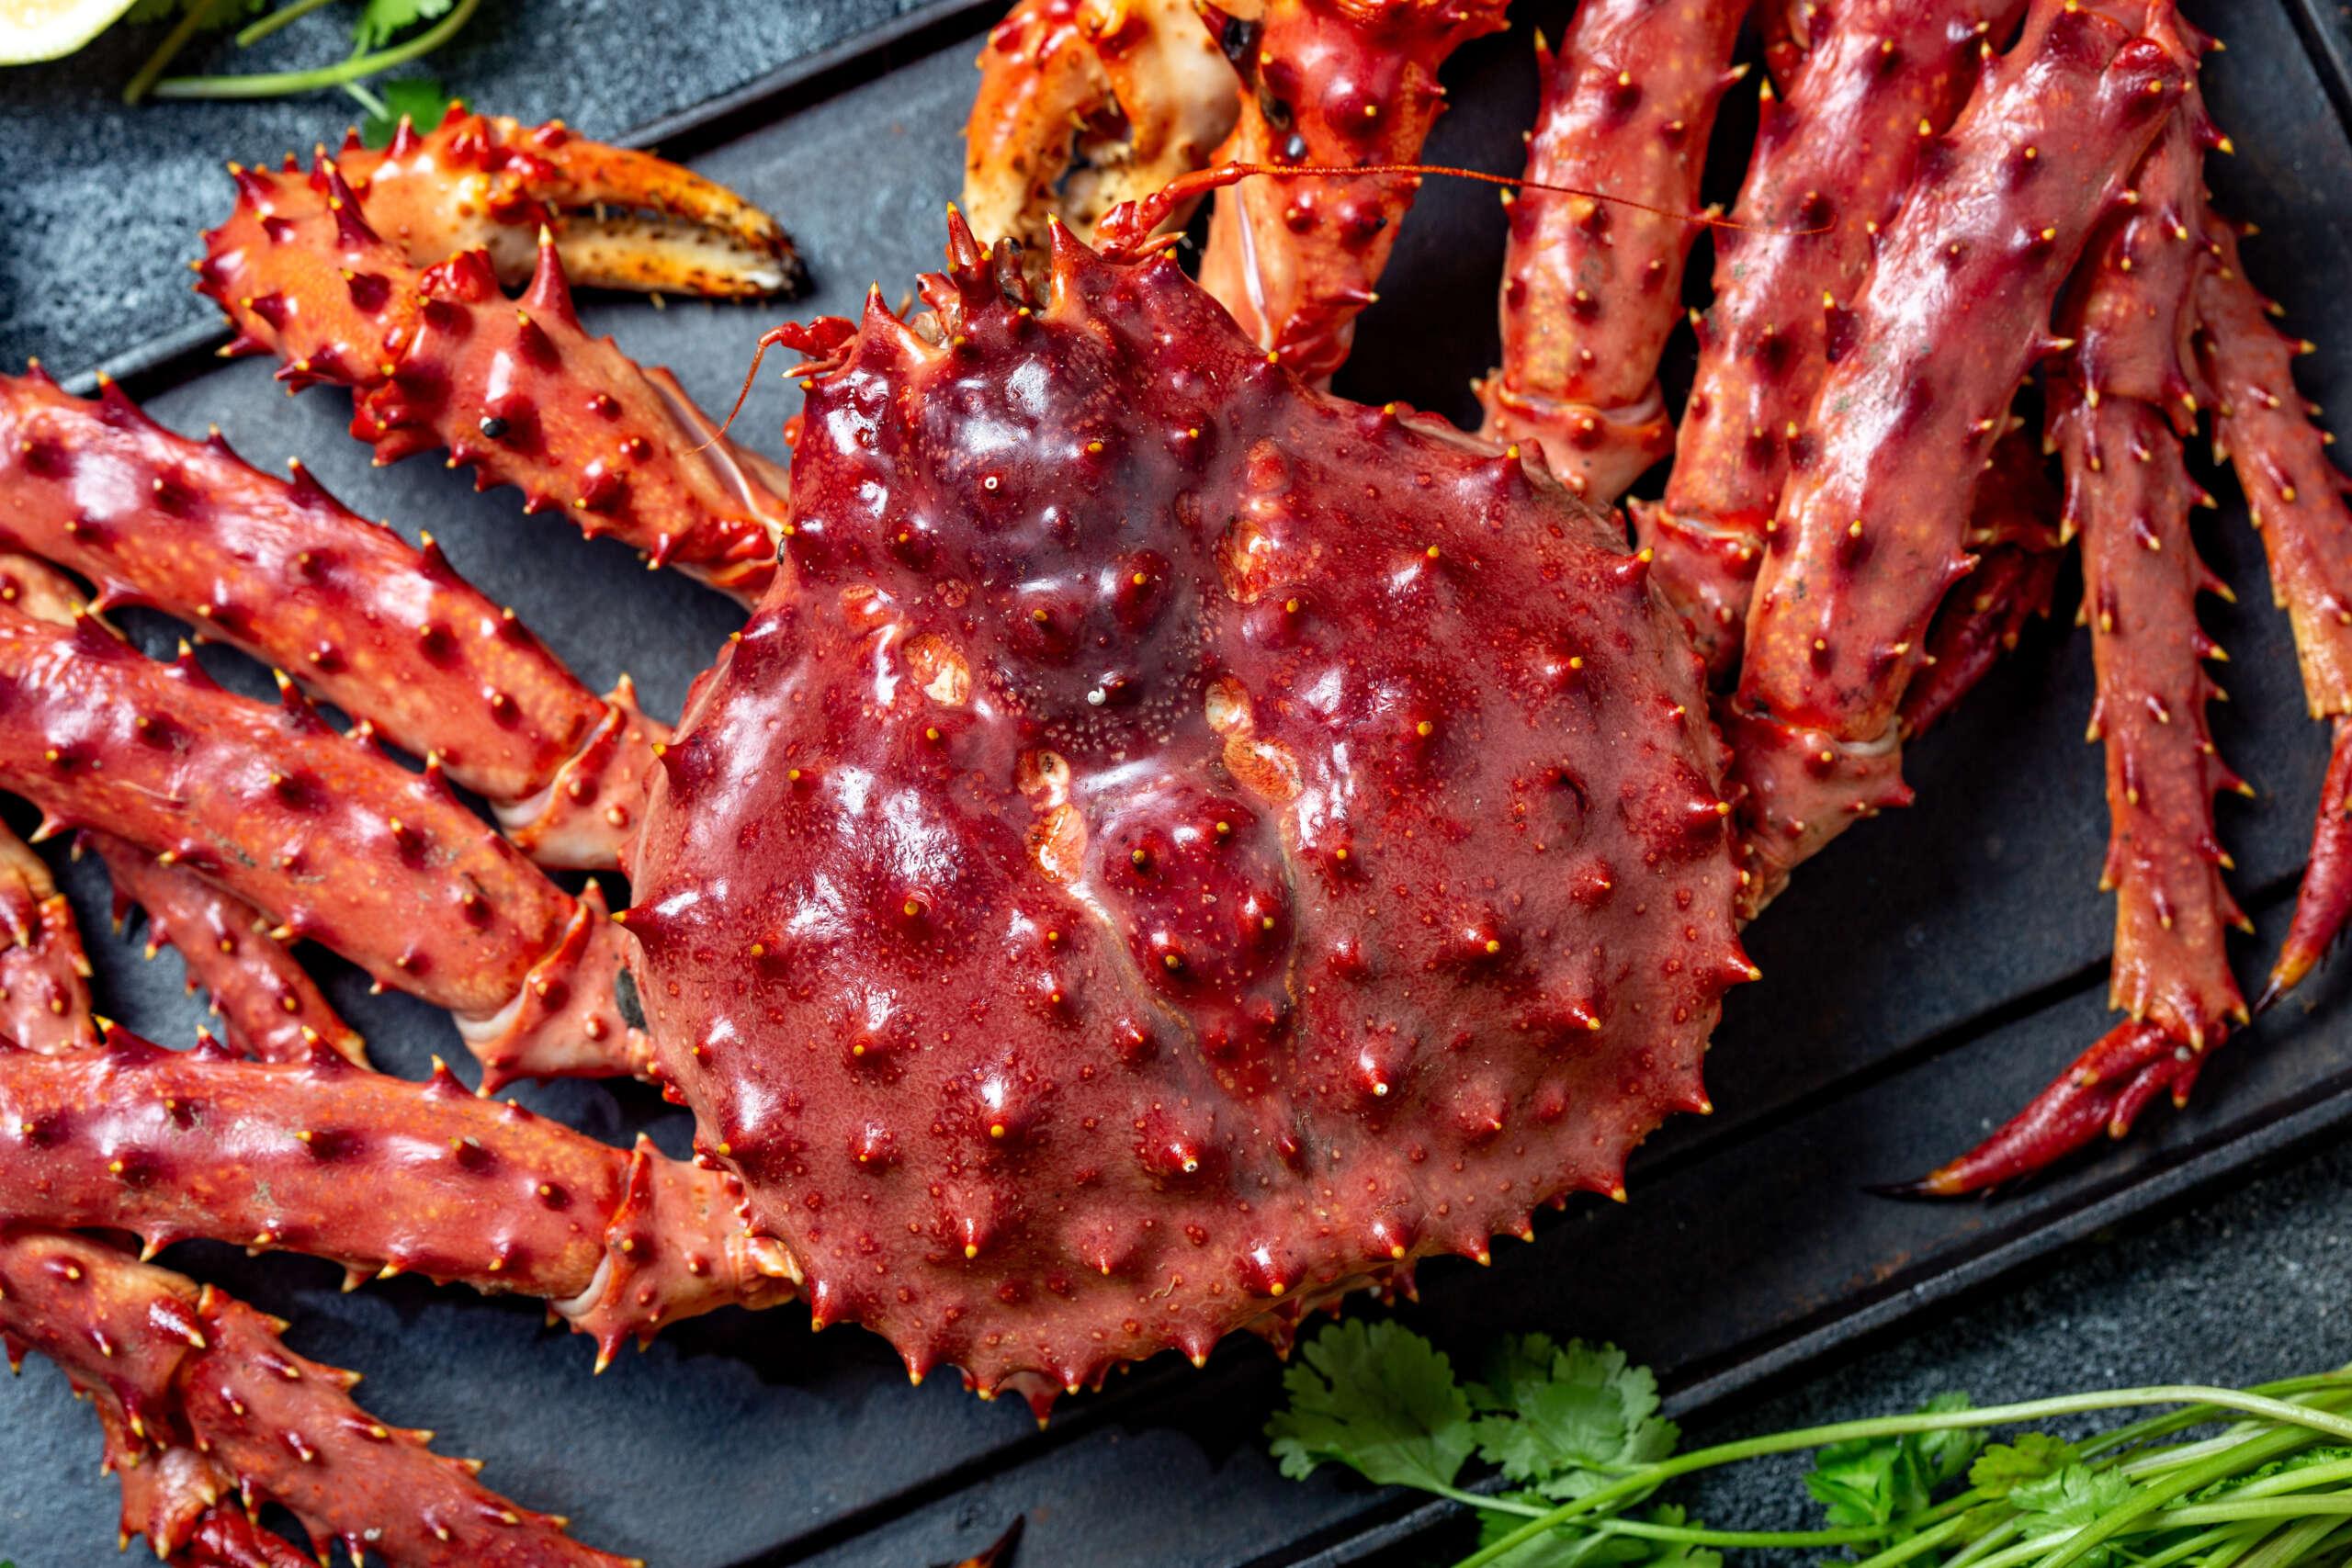 Cooked Organic Alaskan King Crab Legs with lemon and cilantro.